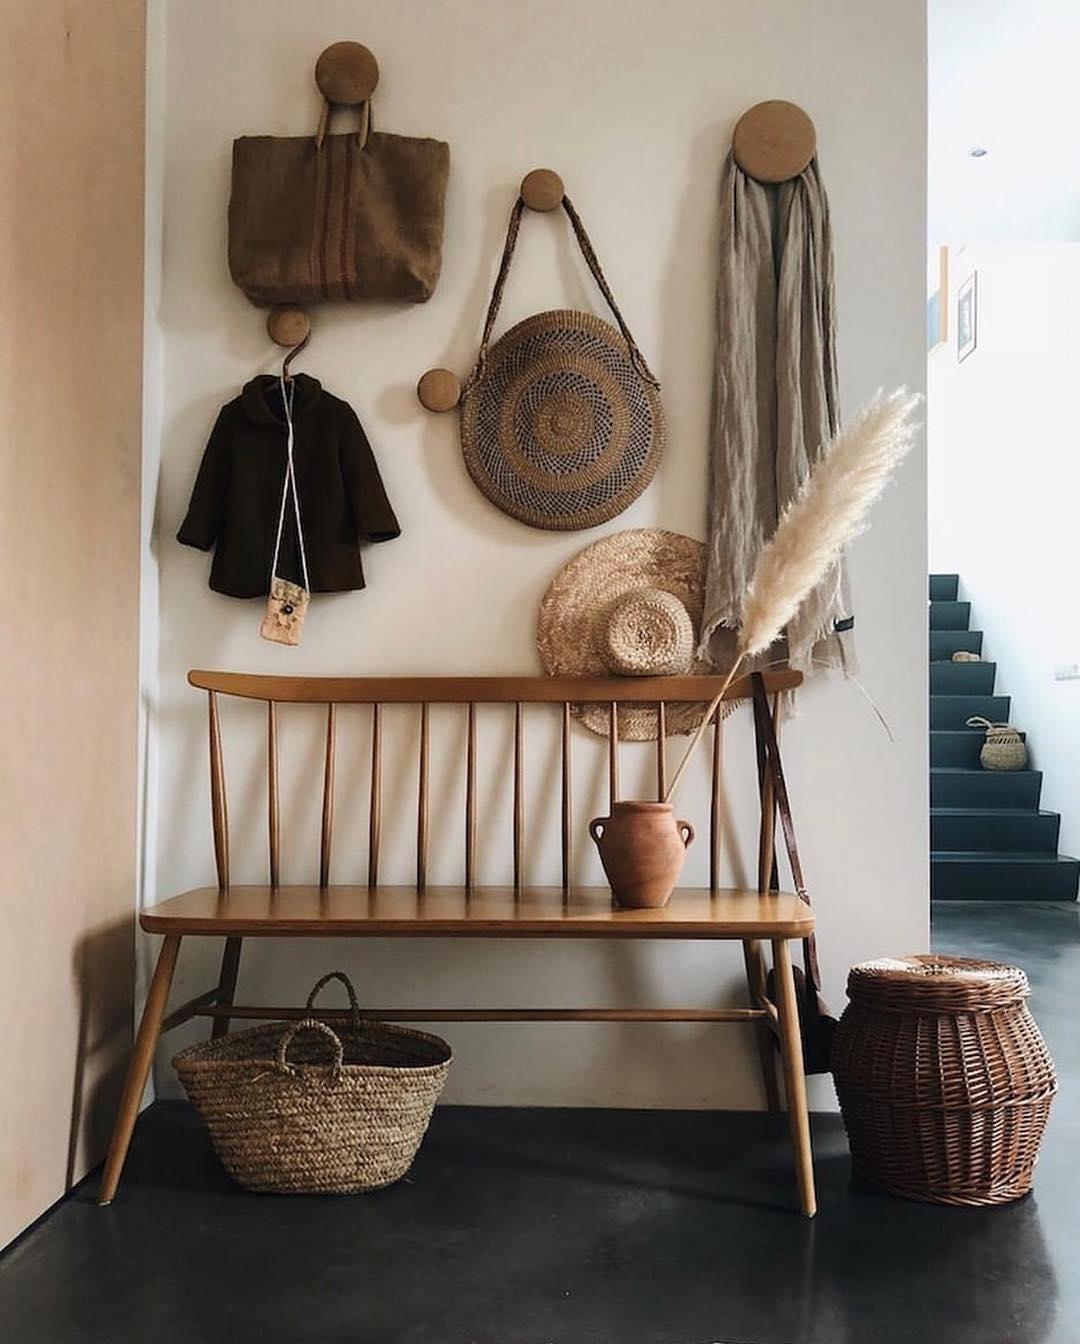 Escape The Clutter The Secrets To Creating A Welcoming Entryway Ideas Home Decor Scandinavian Home Decor